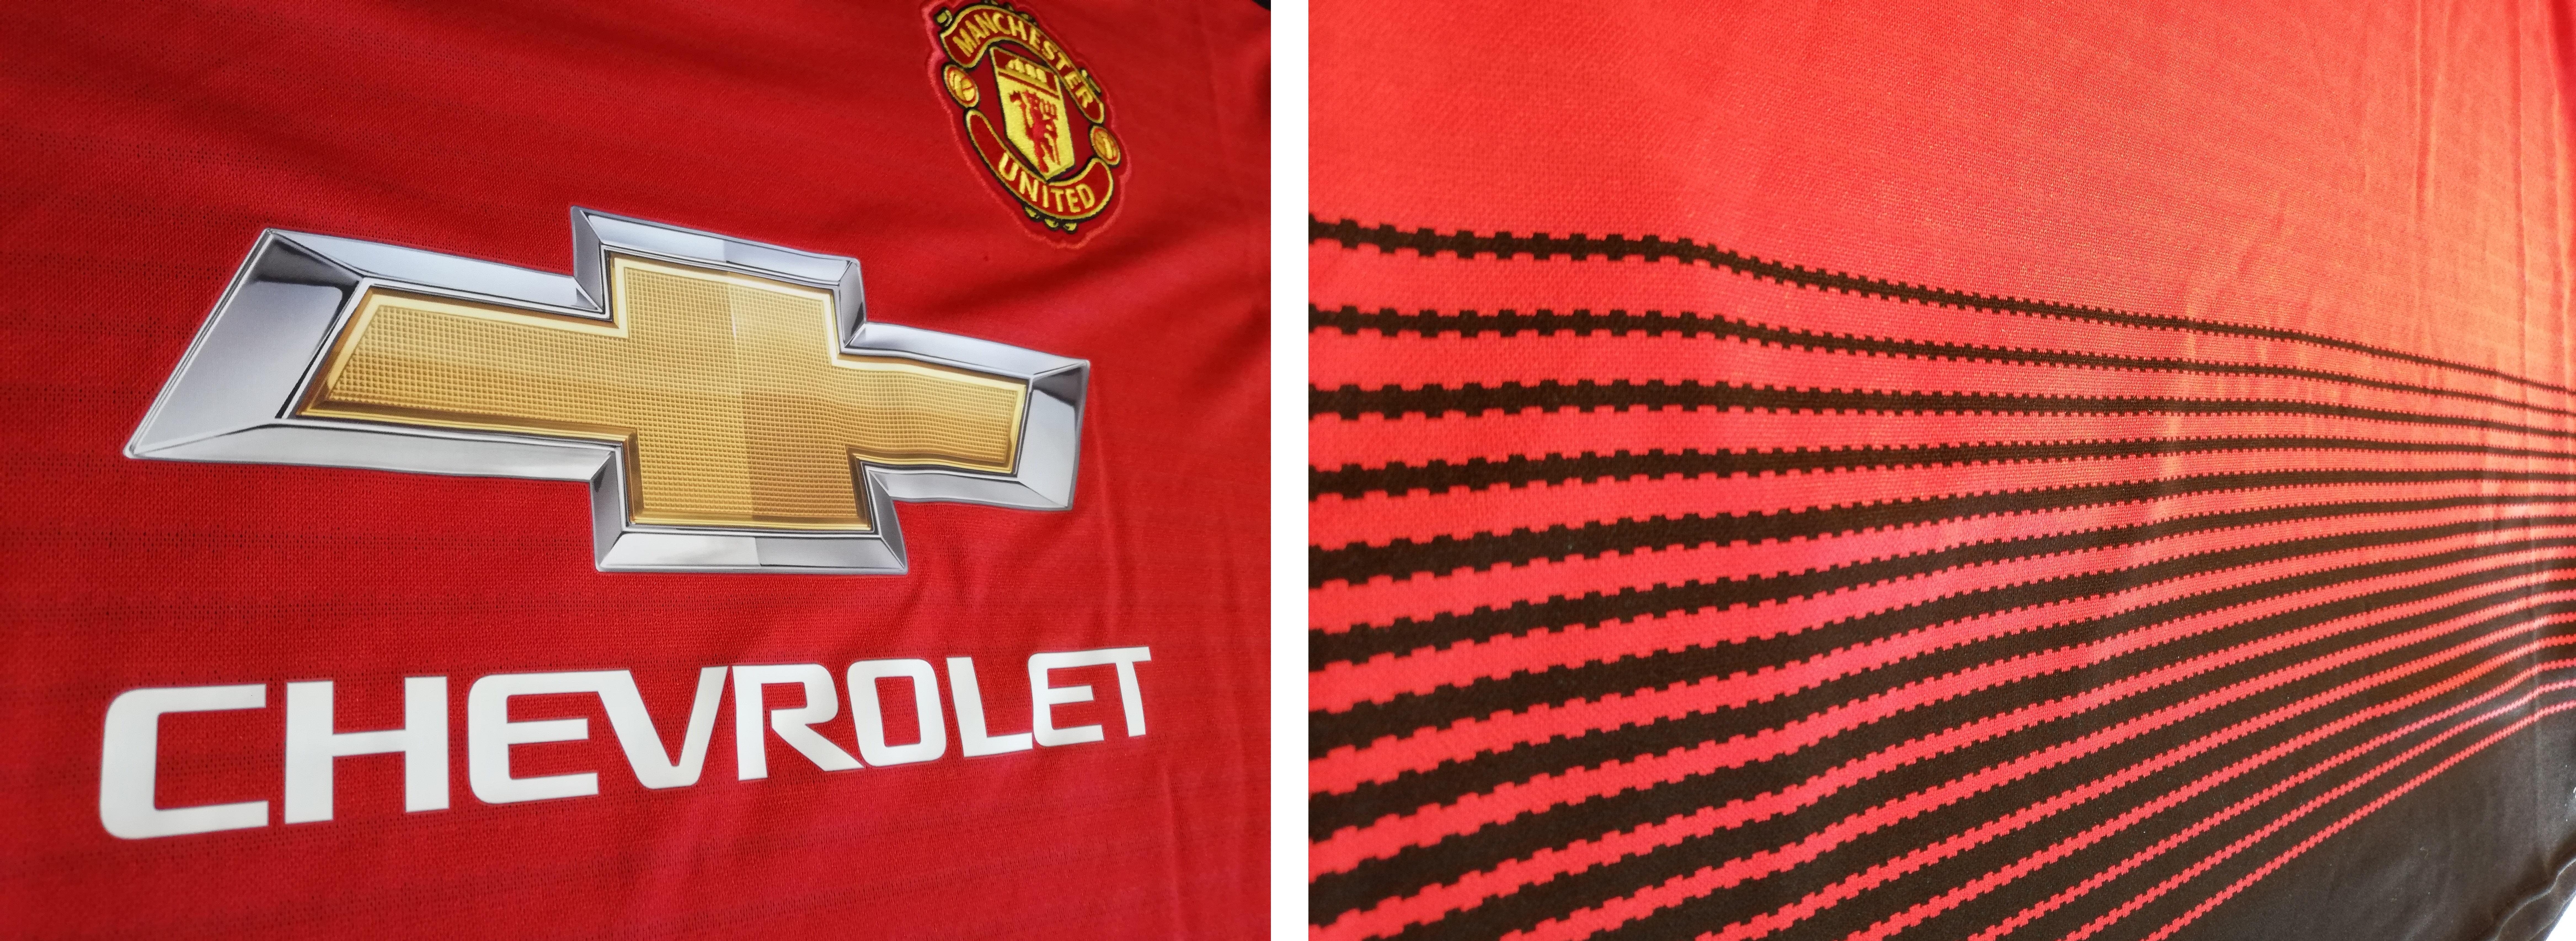 88c2dc04 Manchester United drakter - SportMember.no